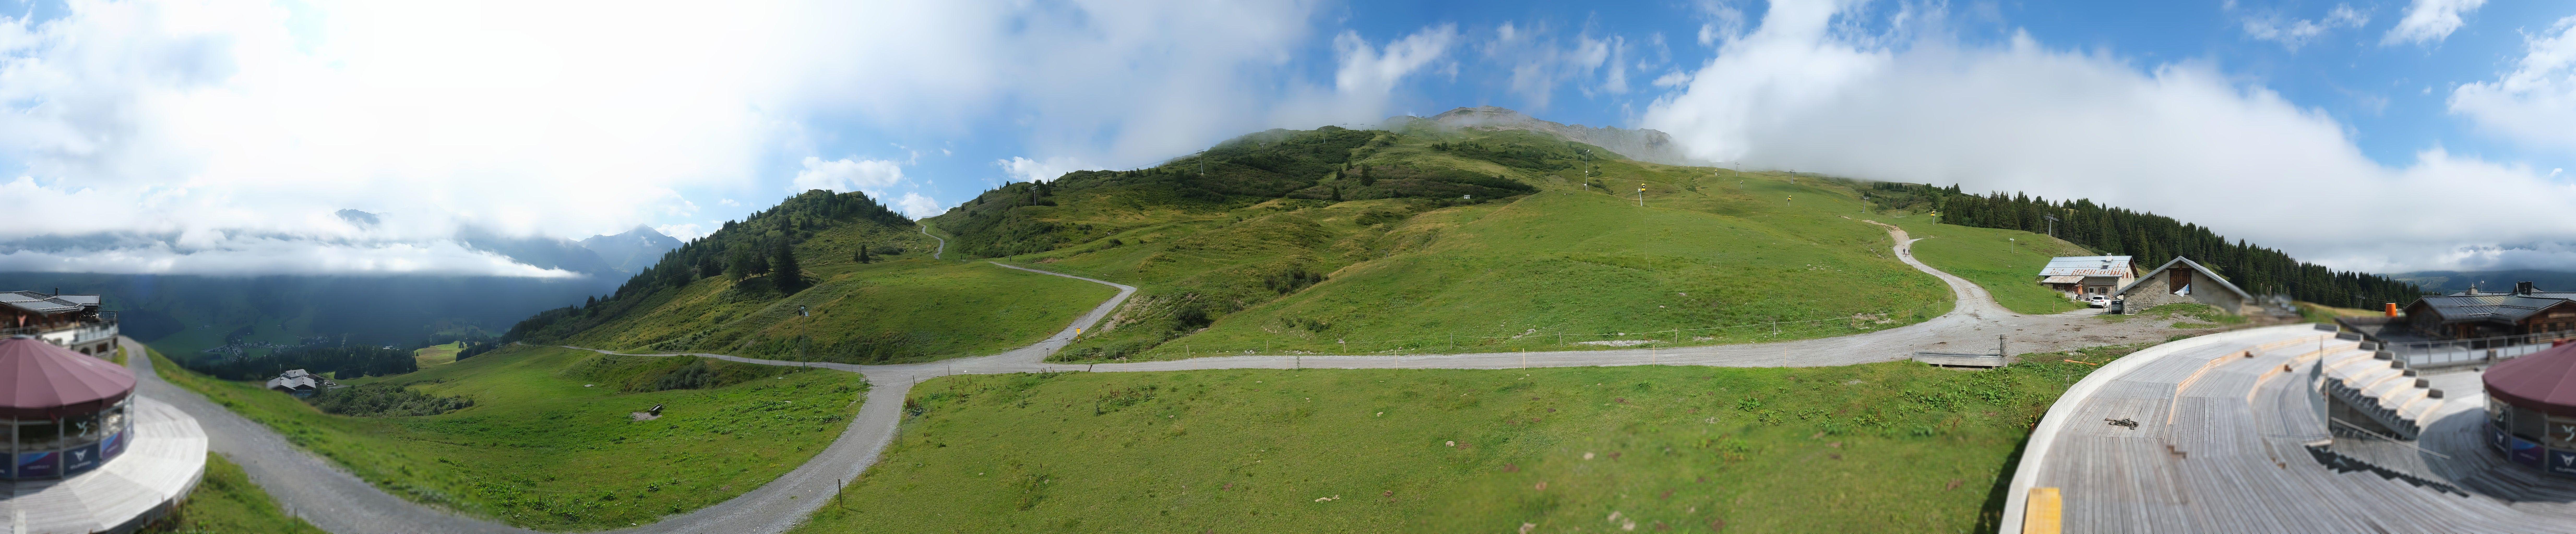 Valbella: Lenzerheide Alp Stätz